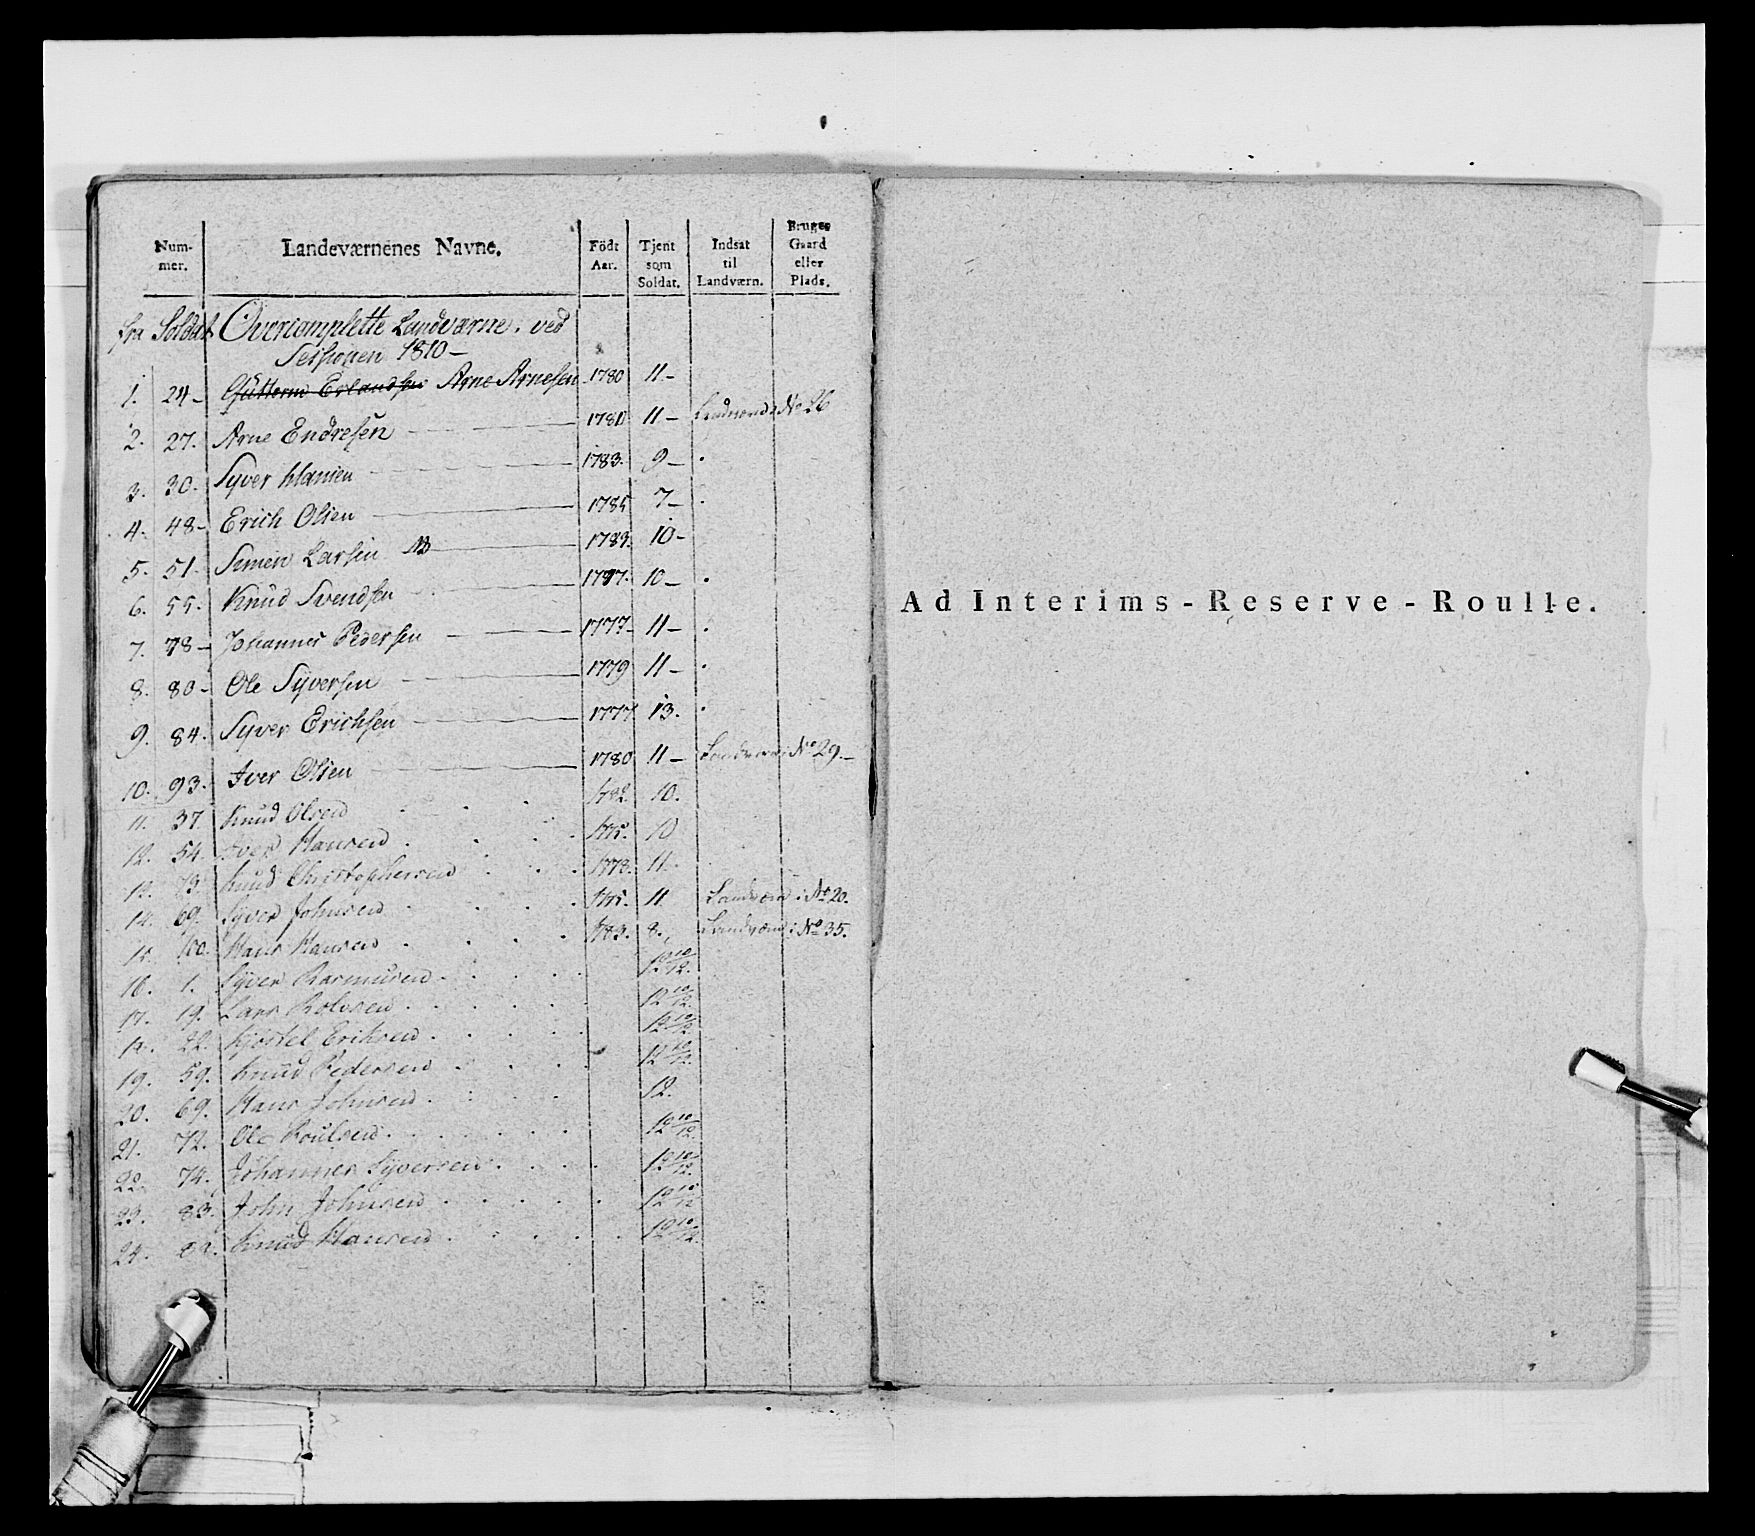 RA, Generalitets- og kommissariatskollegiet, Det kongelige norske kommissariatskollegium, E/Eh/L0069: Opplandske gevorbne infanteriregiment, 1810-1818, s. 353